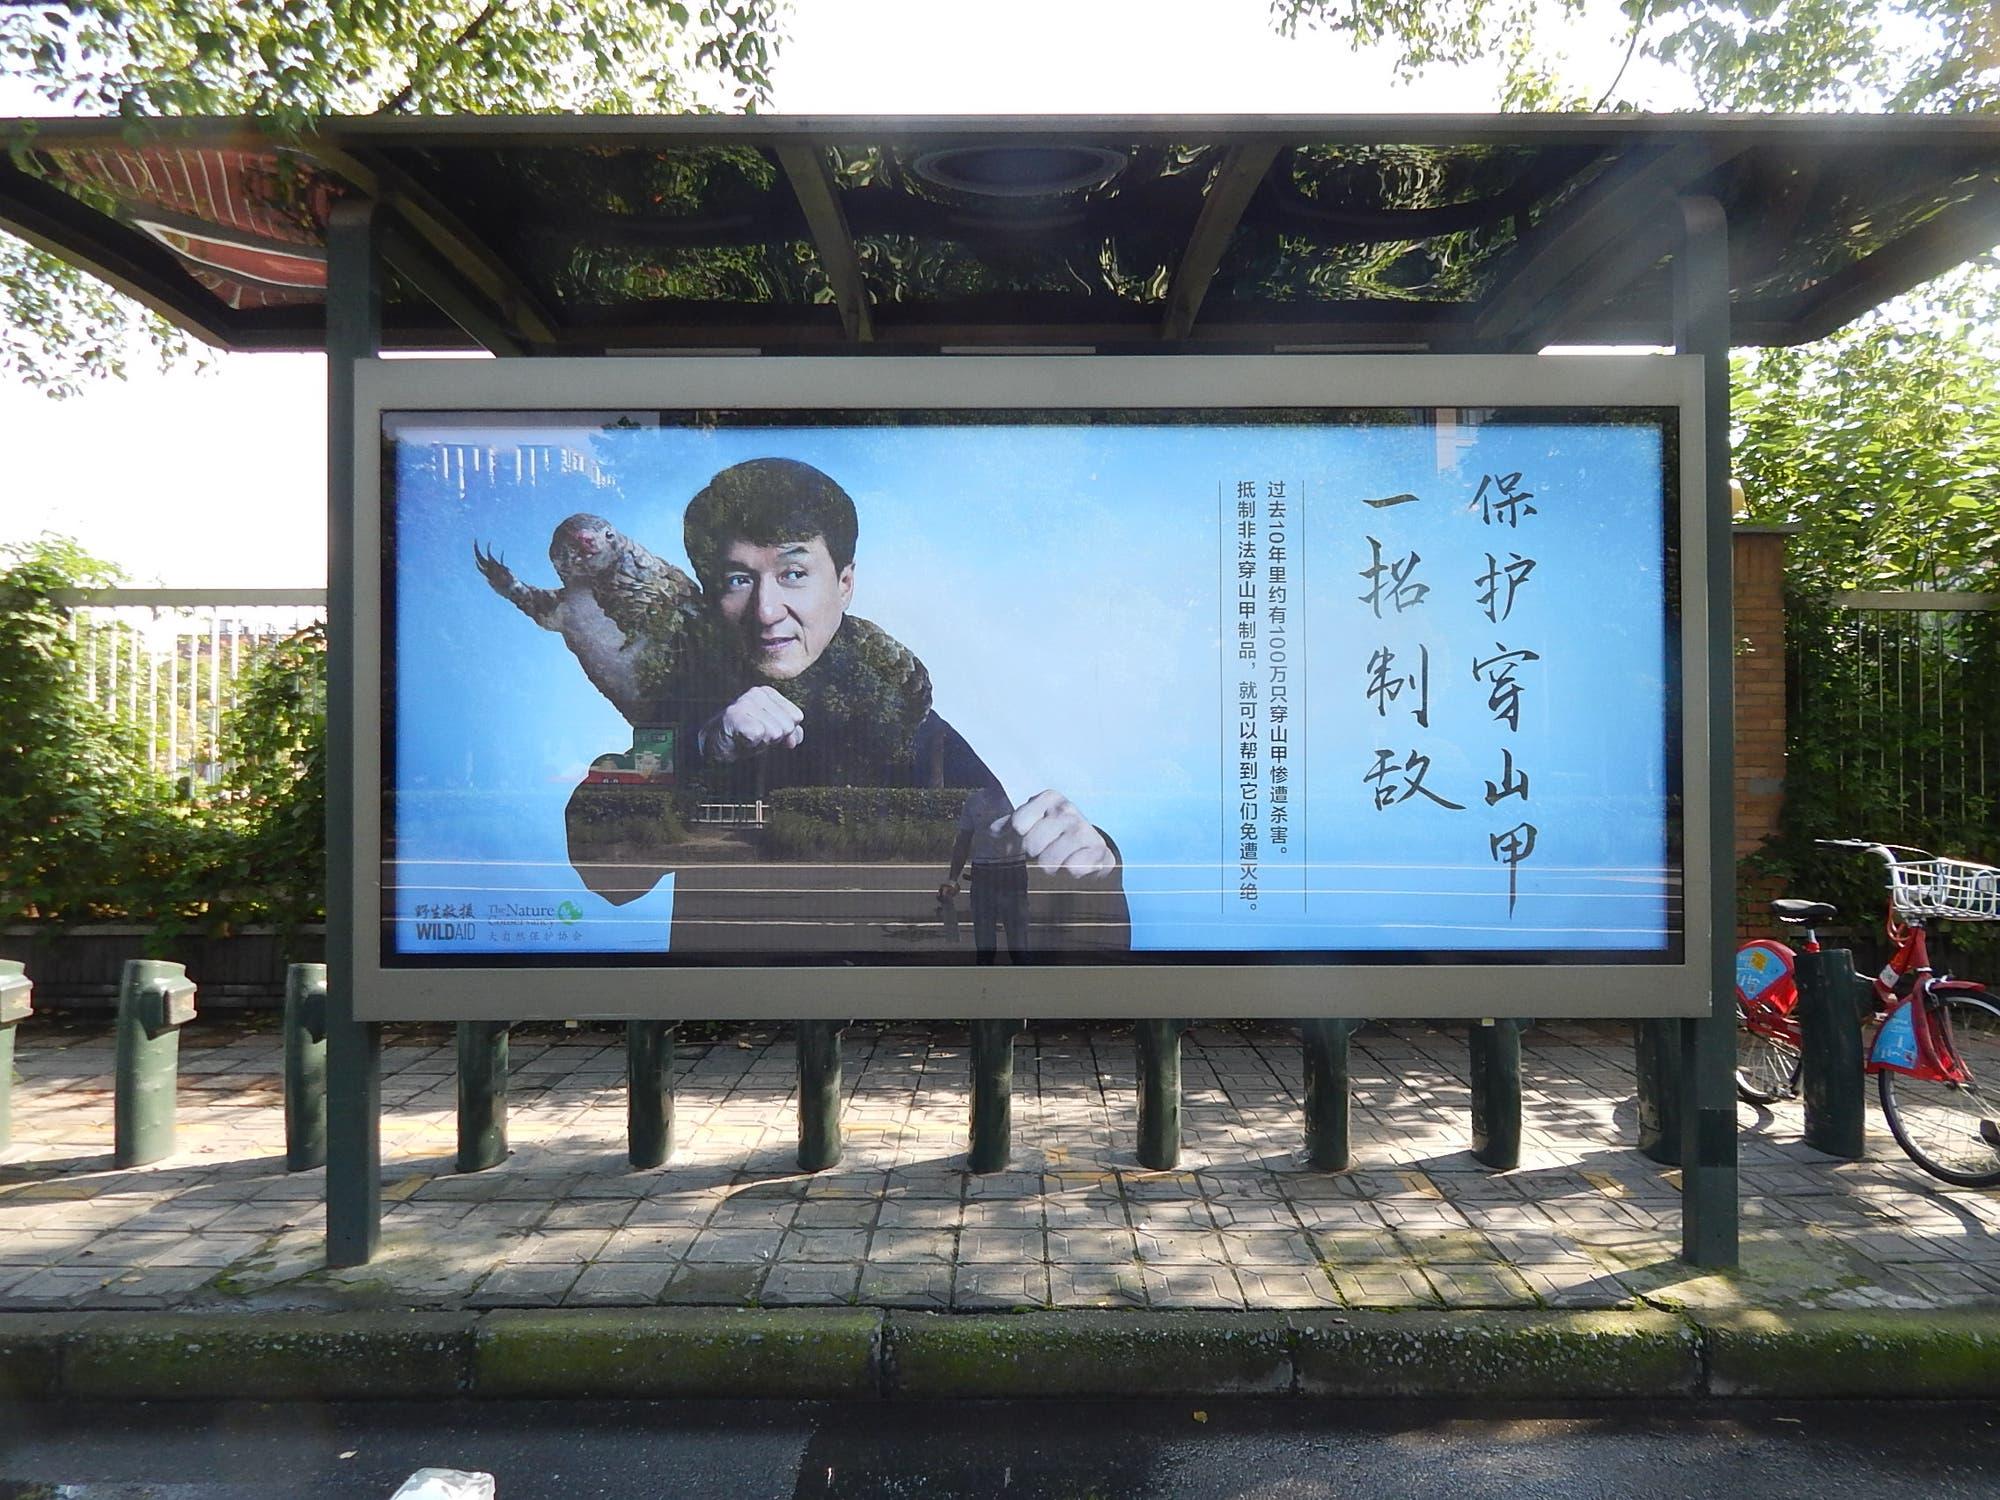 Reklame in Hangzhou